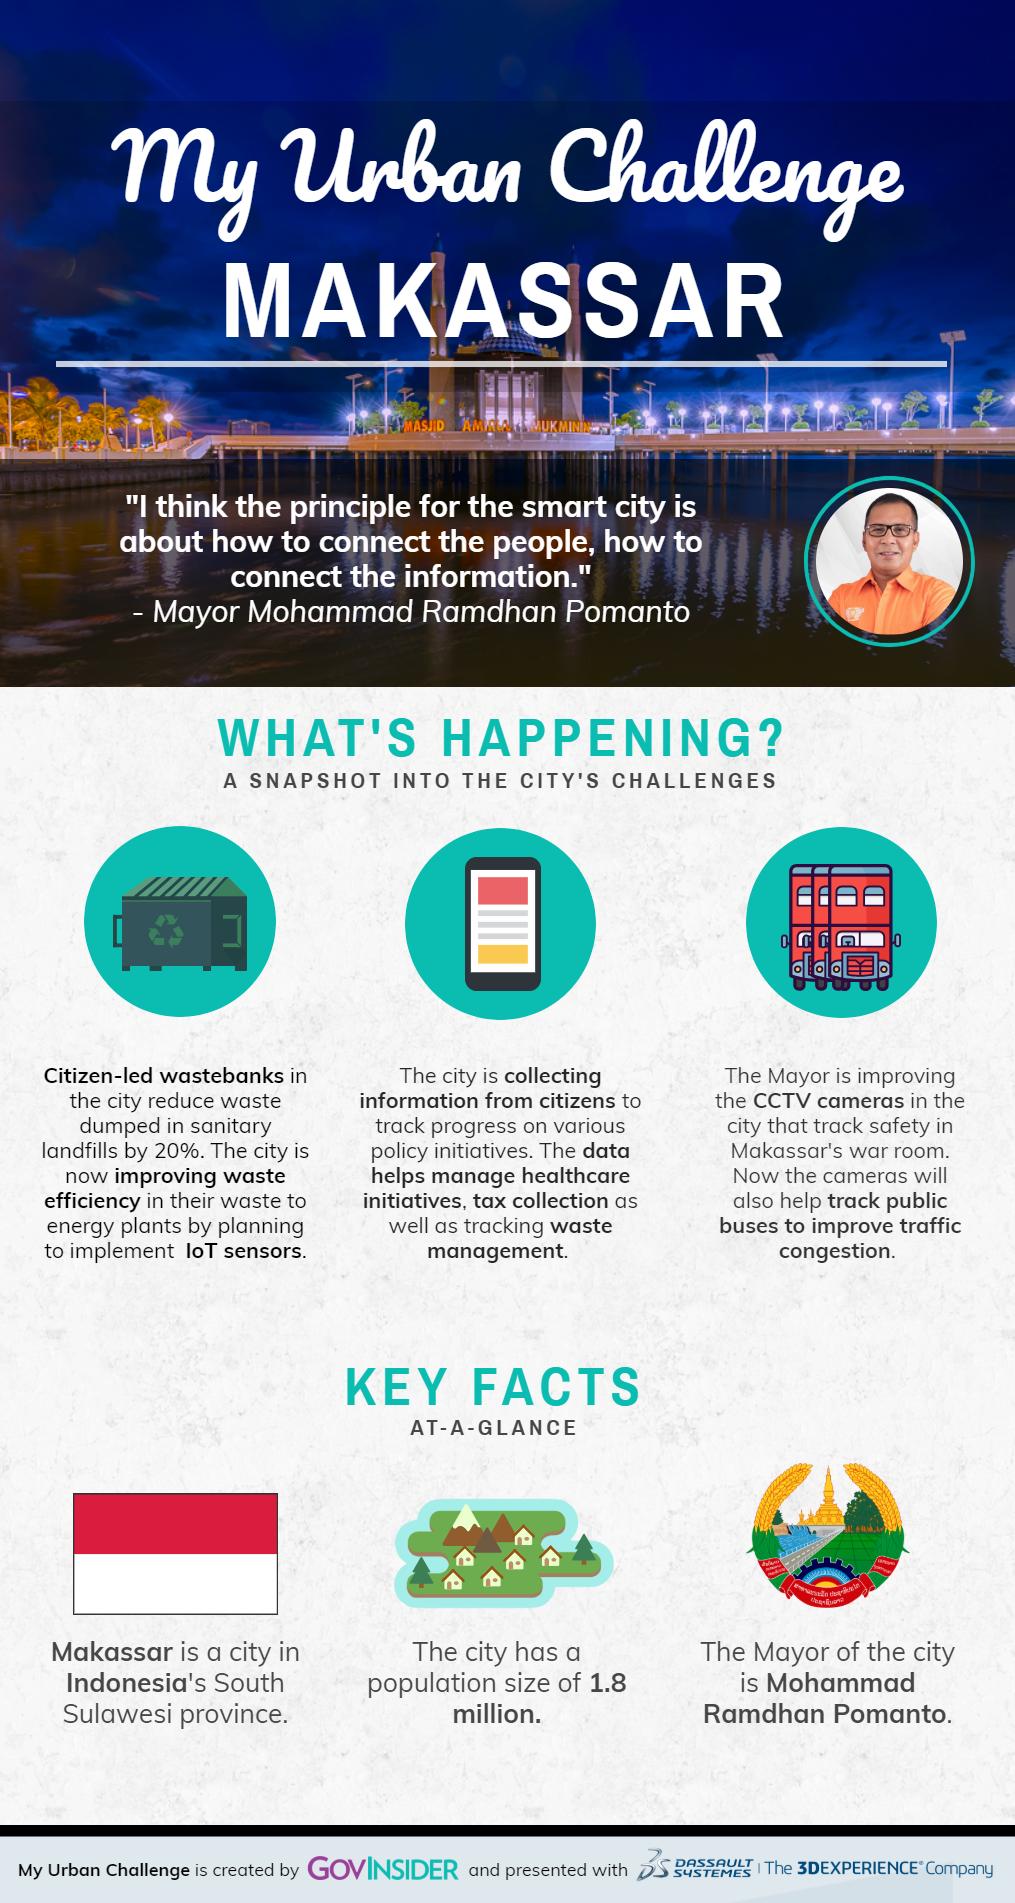 my urban challenge infographic with dassault systemes by govinsider part 3 makassar